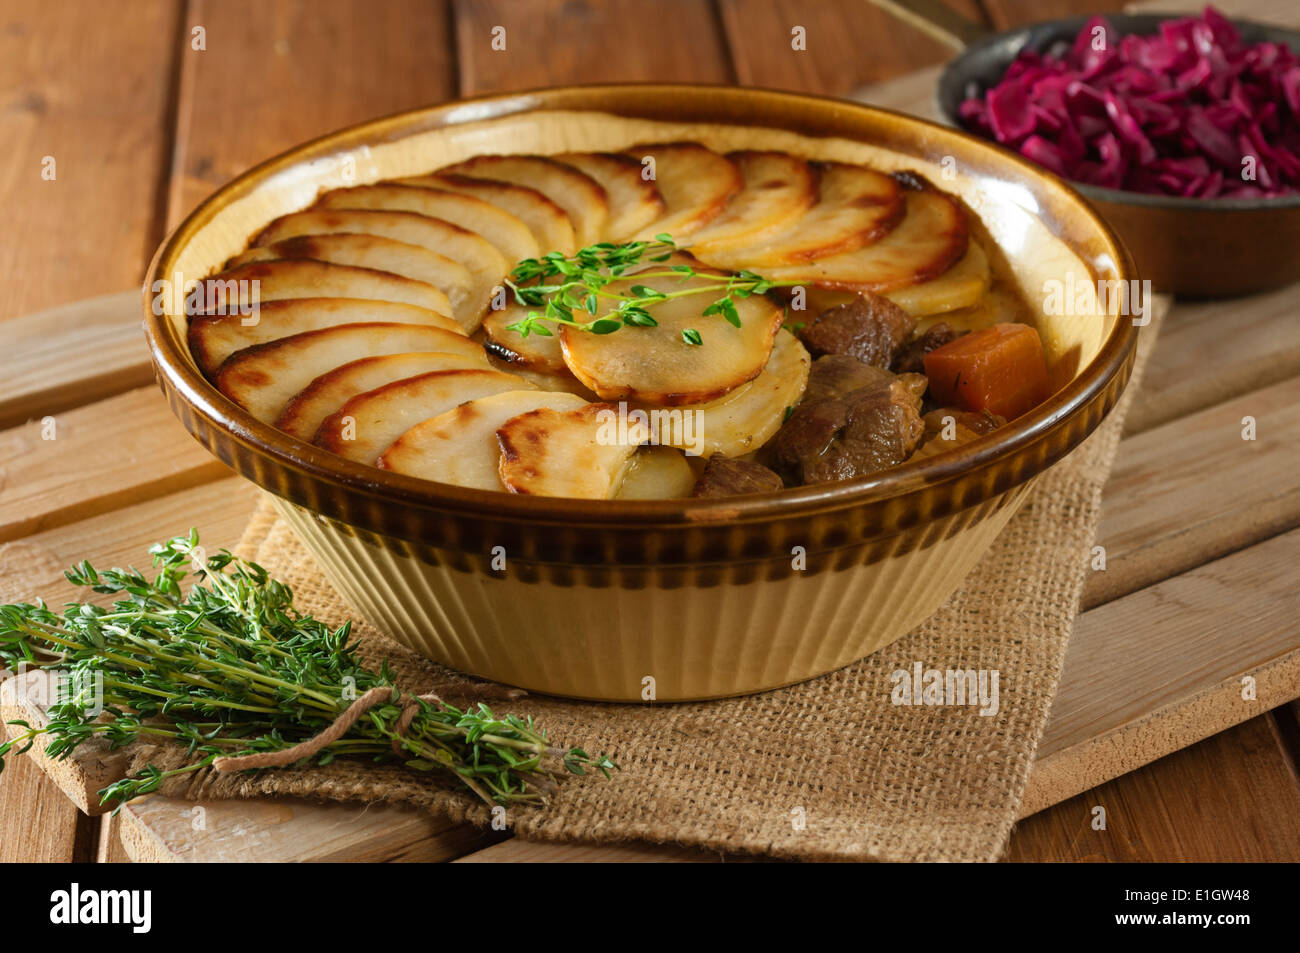 Lancashire Hotpot Traditional Lamb And Potato Dish Uk Food